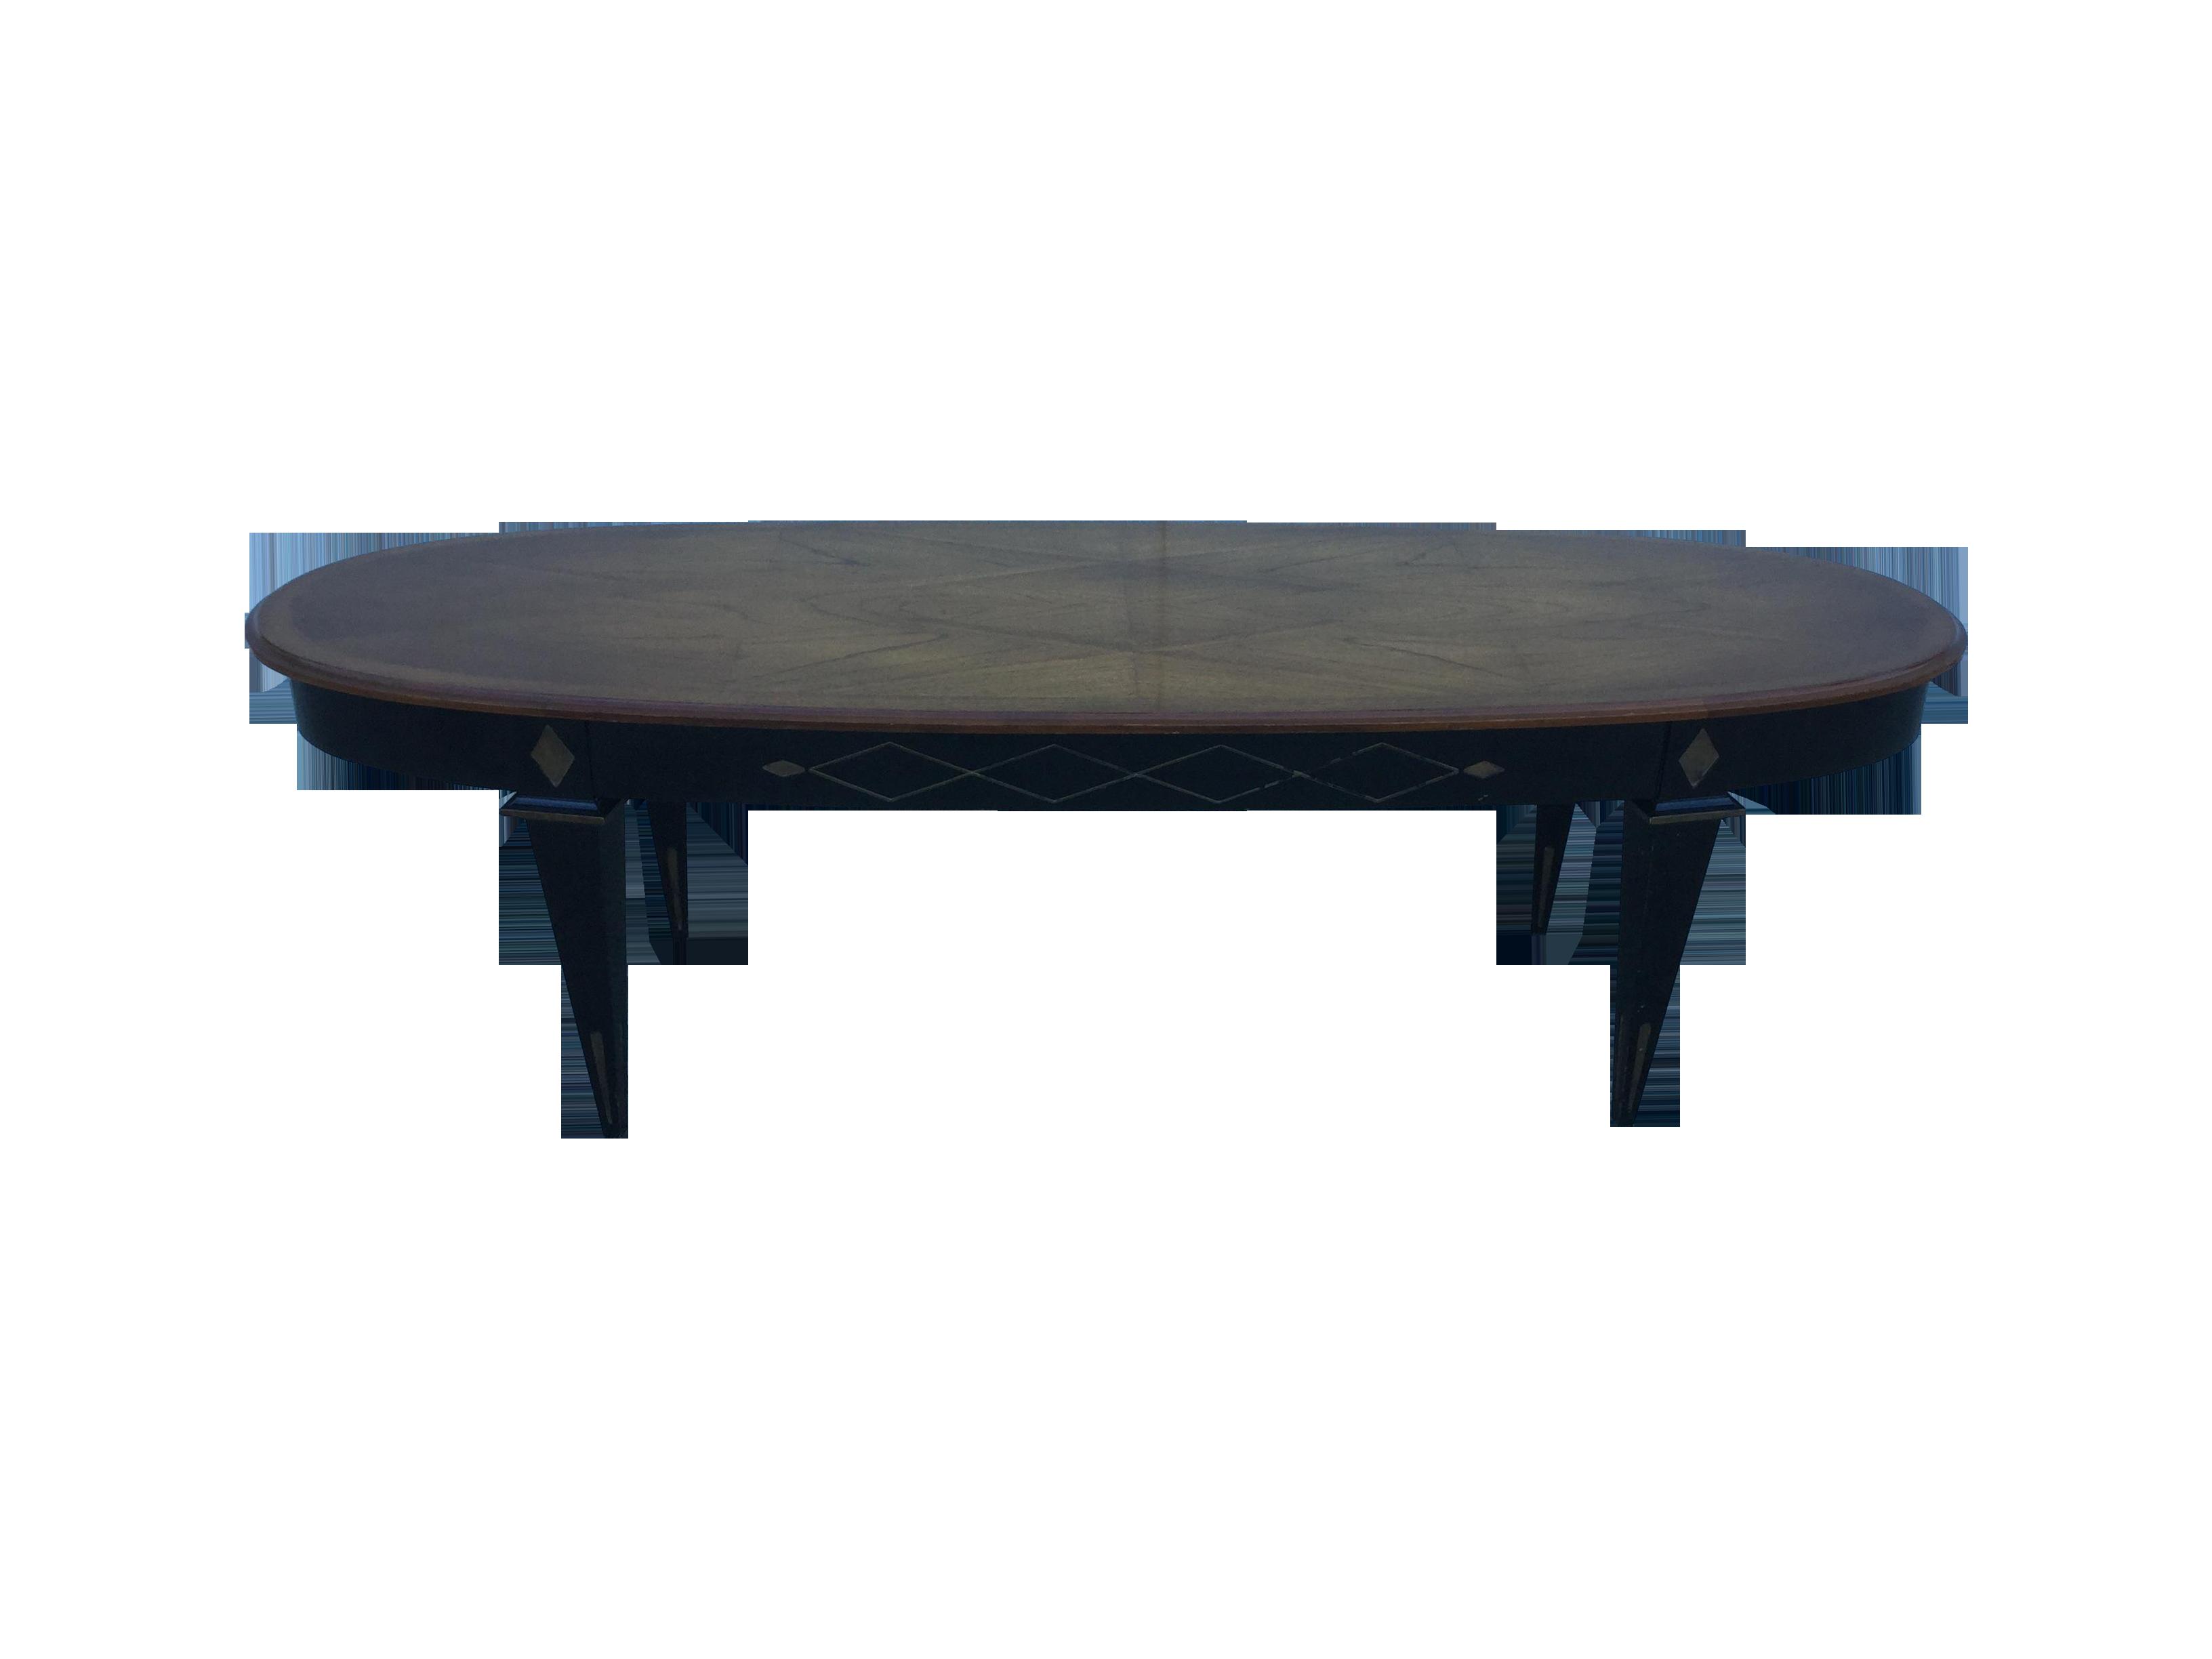 1950's schmieg & kotzian coffee table | chairish